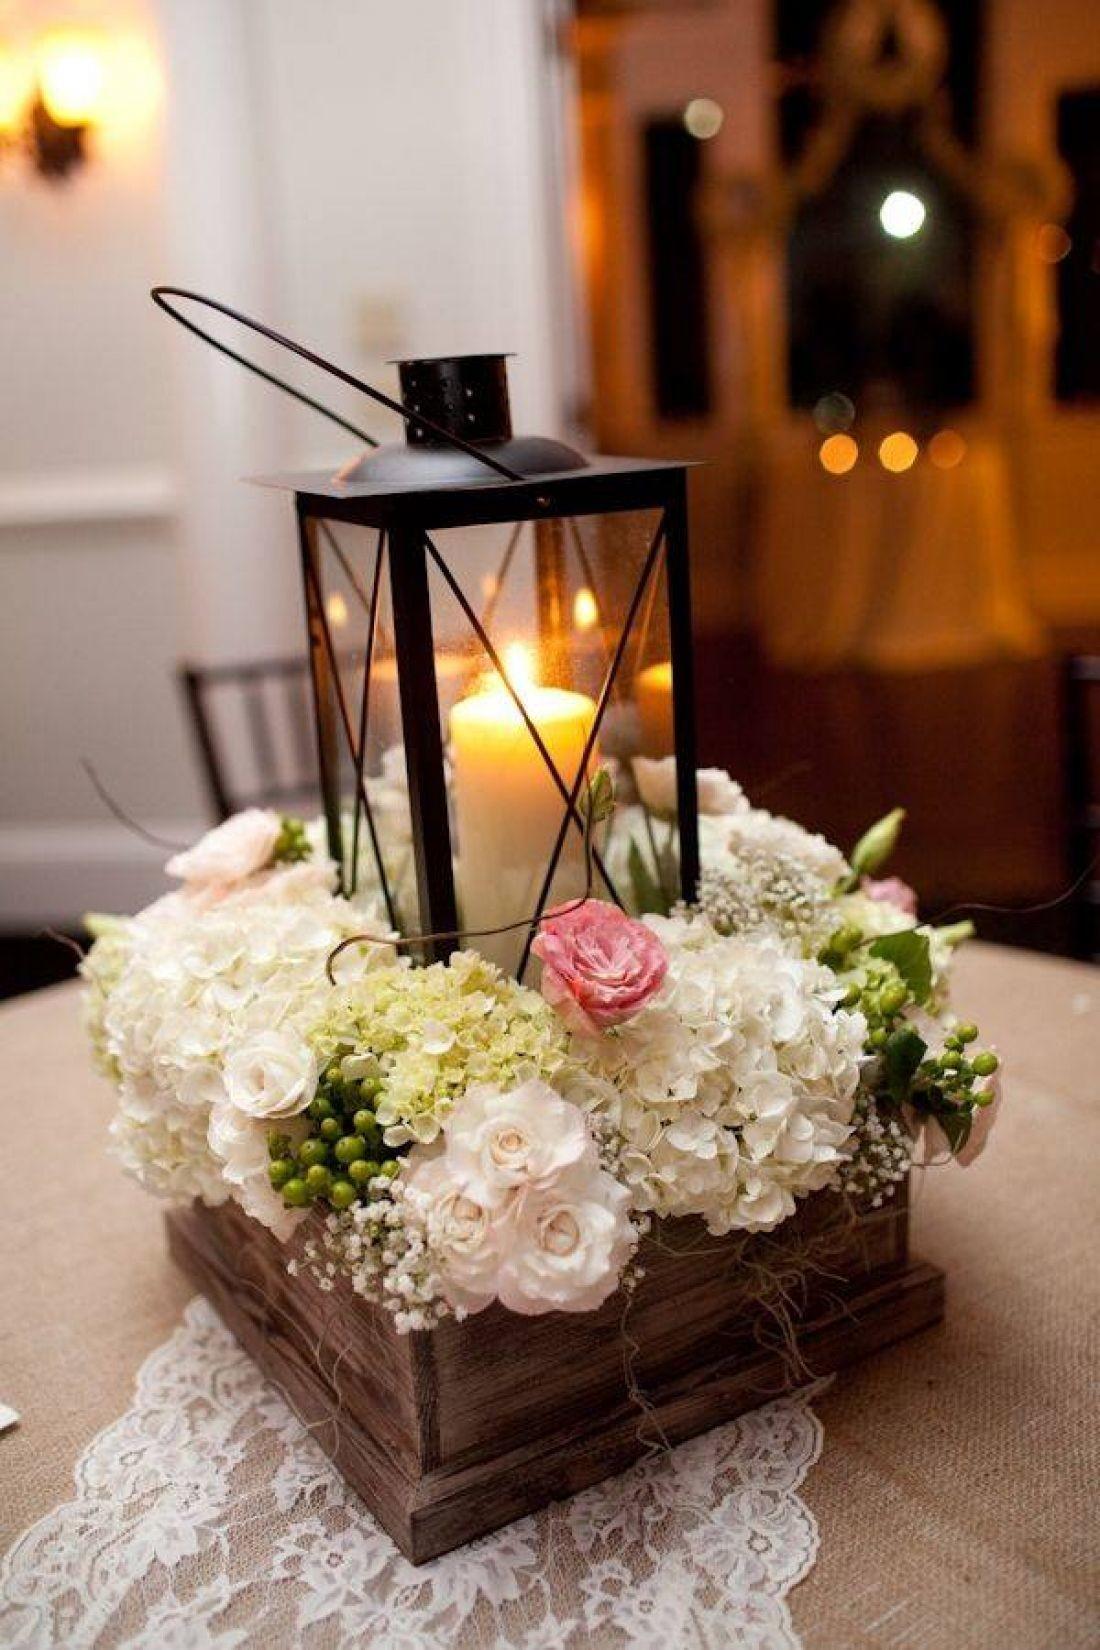 Композиция свечами и цветами фото